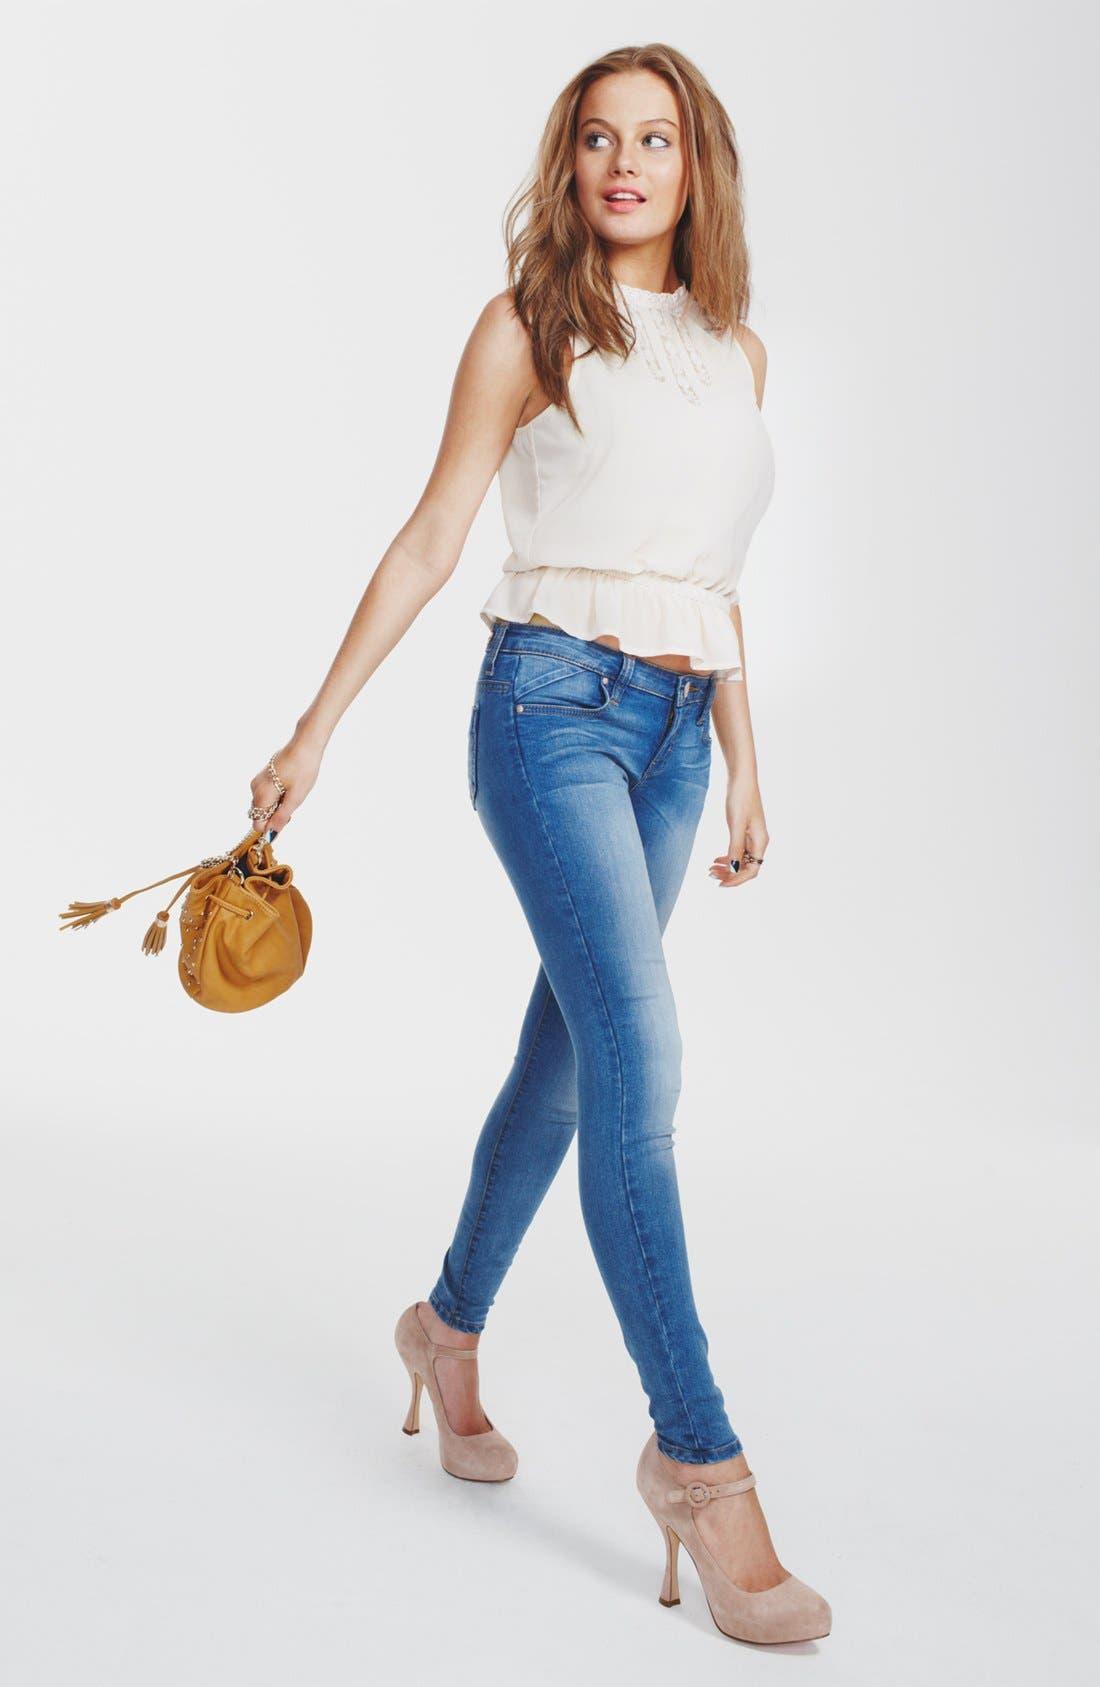 Main Image - Lush Tank & STS Blue Skinny Jeans